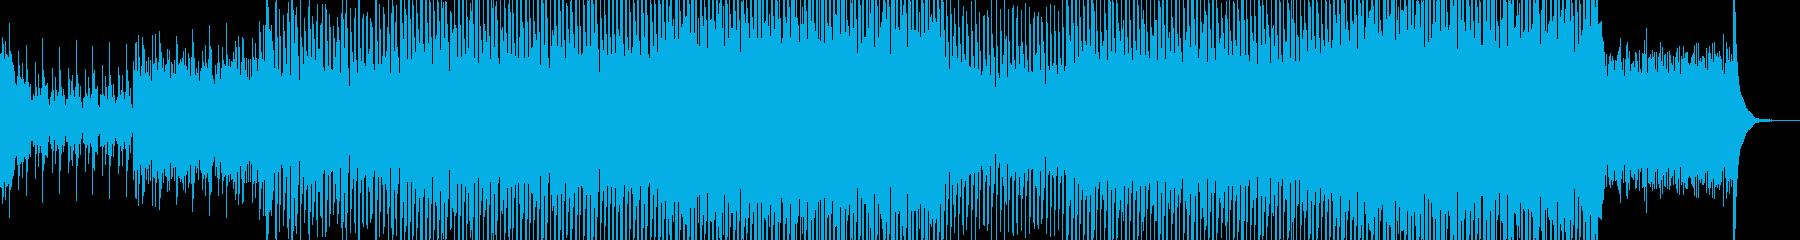 EDM現代的なシンセのクラブ系-06の再生済みの波形